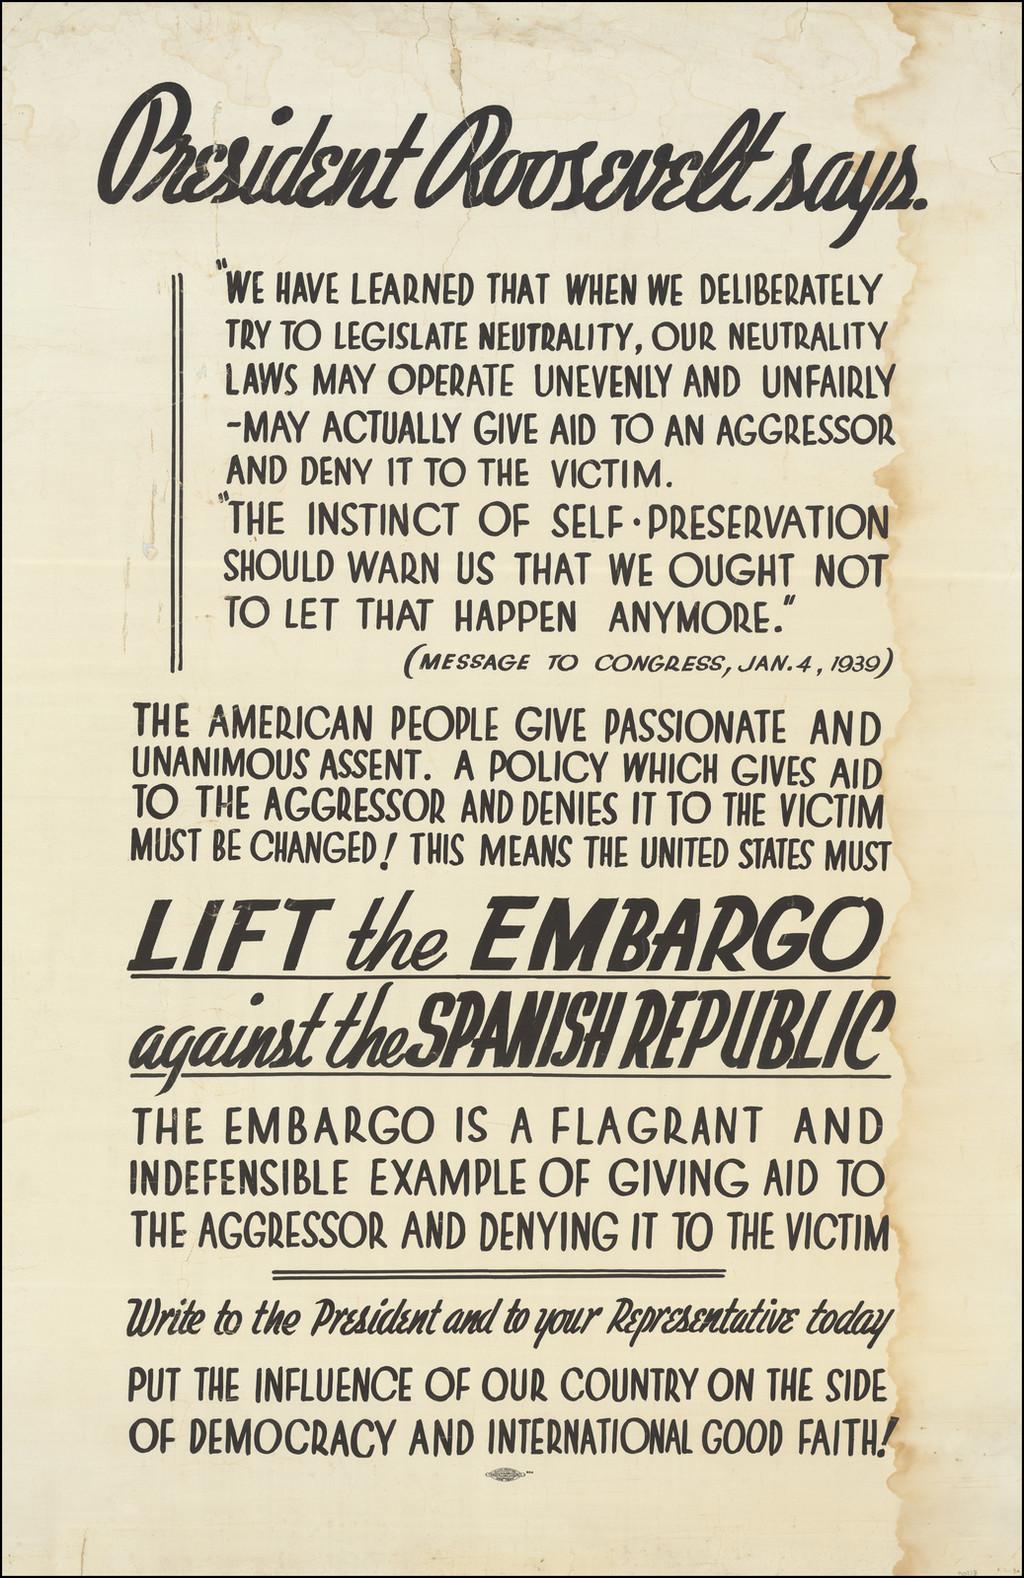 (Pro-Spanish Republic Political Broadside)  [Lift The Embargo Against The Spanish Republic]  President Roosevelt says . . .  By